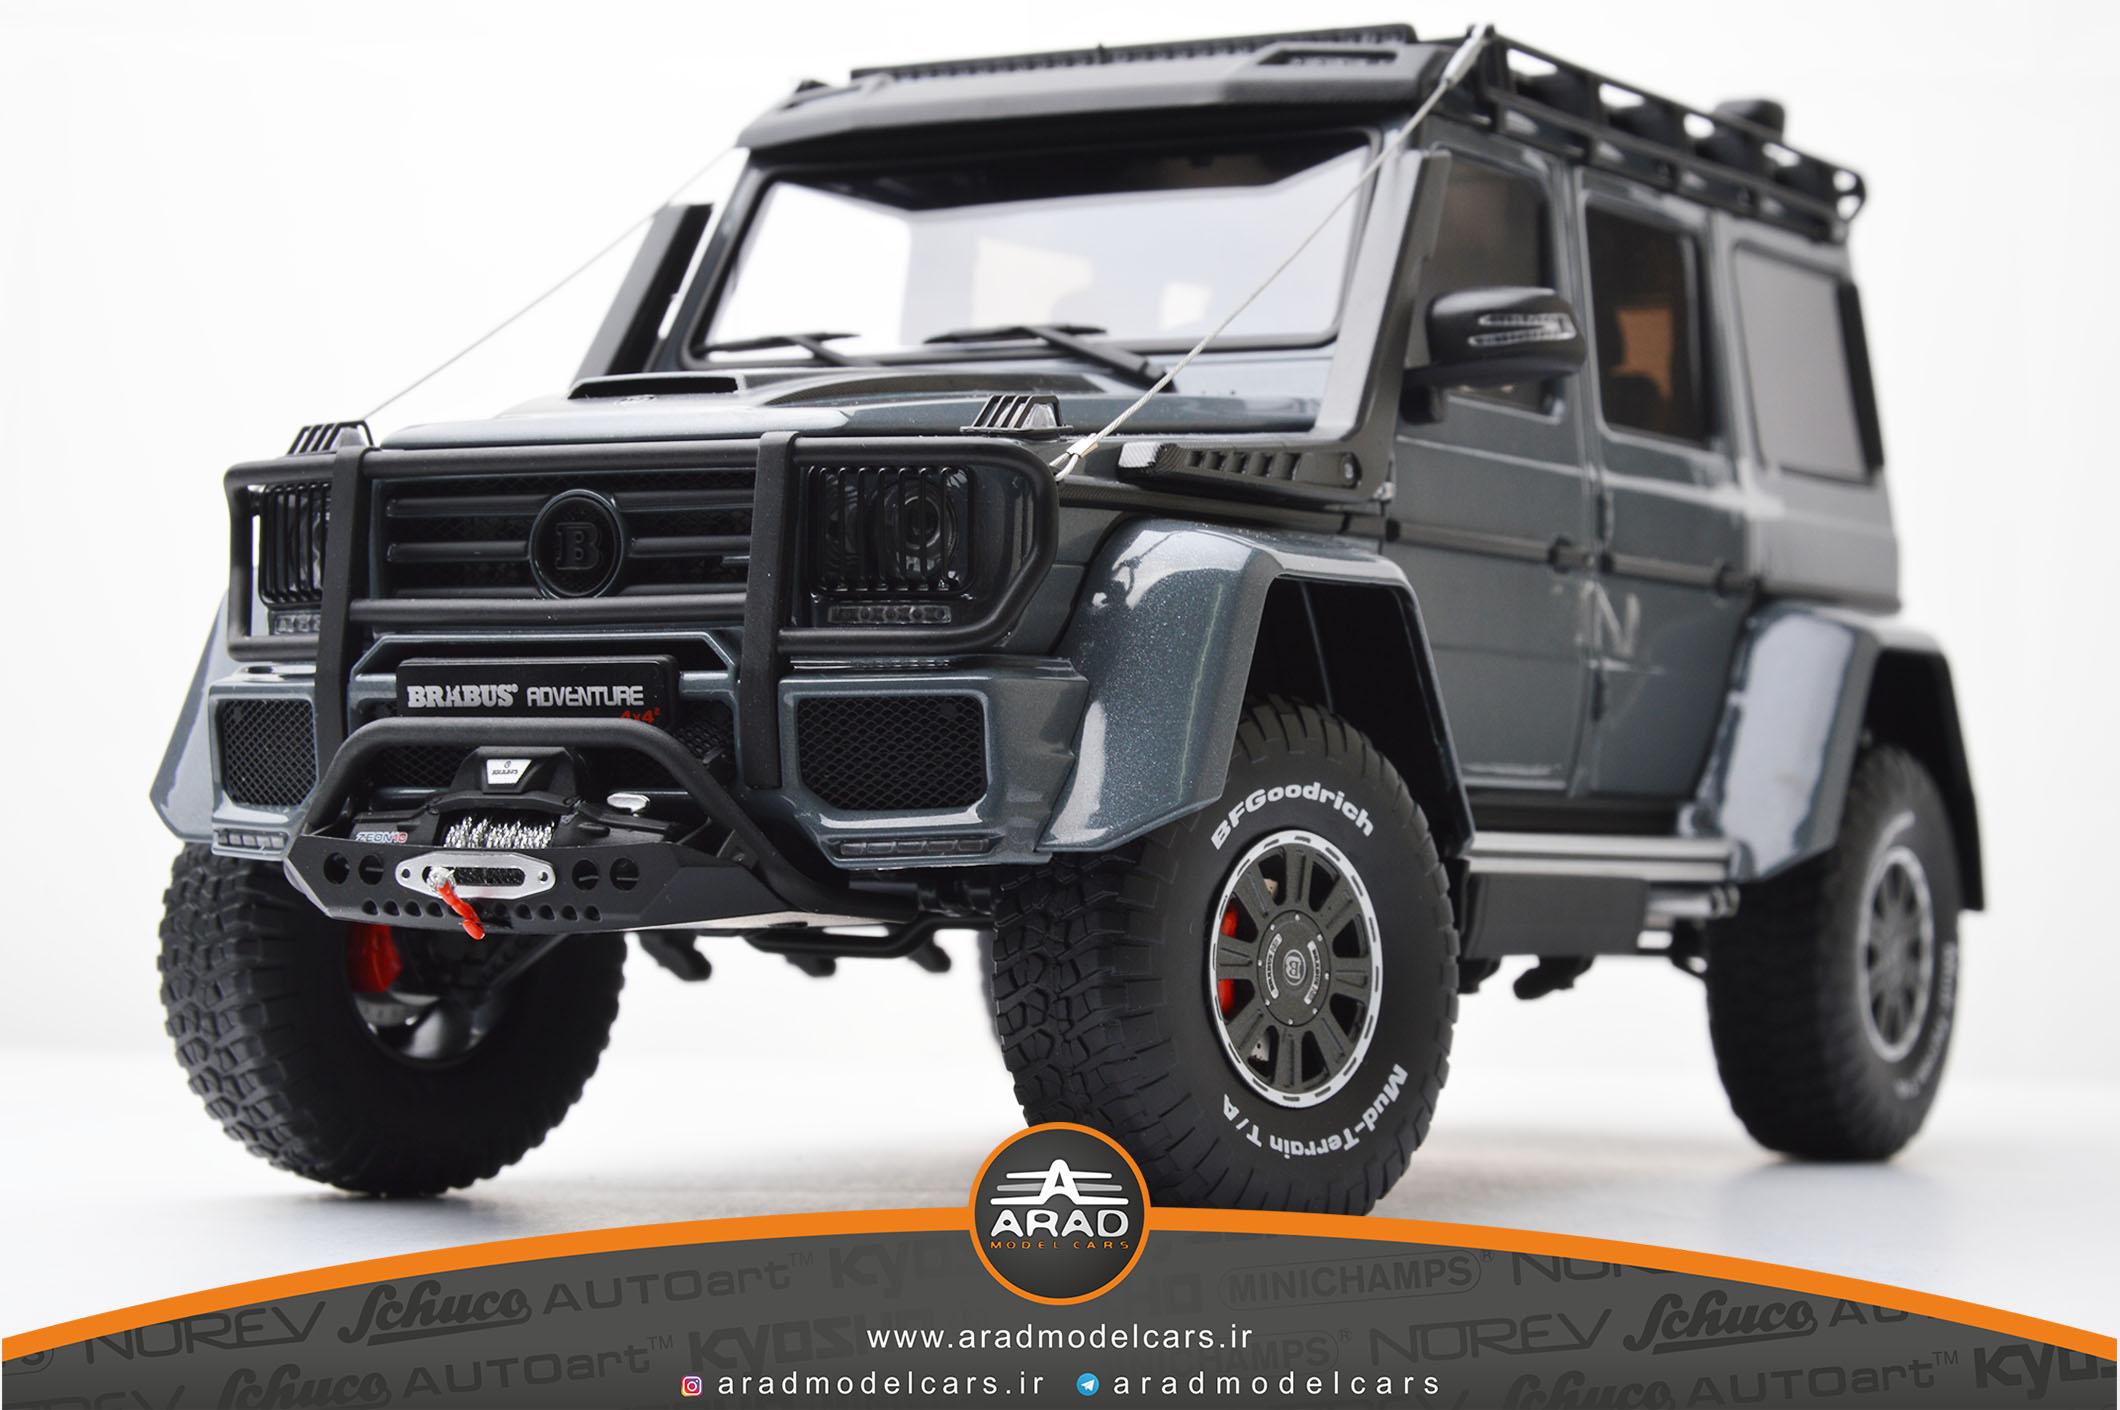 Mercedes Benz G550 Brabus Adventure - Metalic Gray